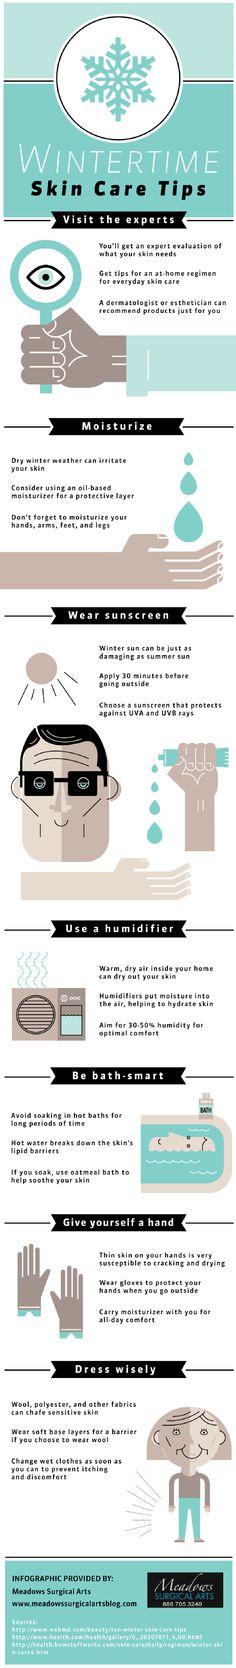 Wintertime Skin Care Tips